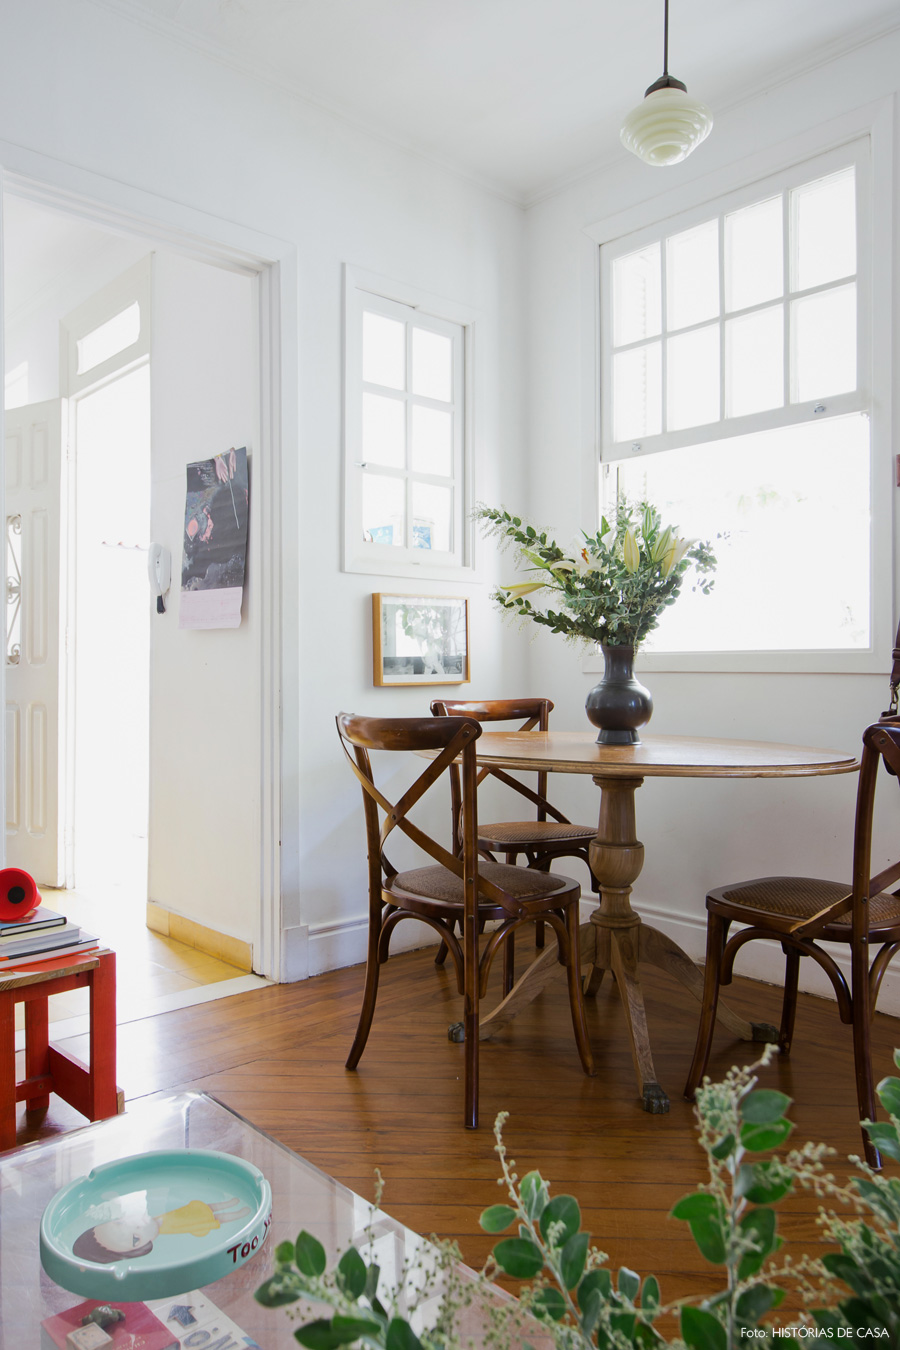 16-decoracao-casa-antiga-sala-jantar-mesa-thonet